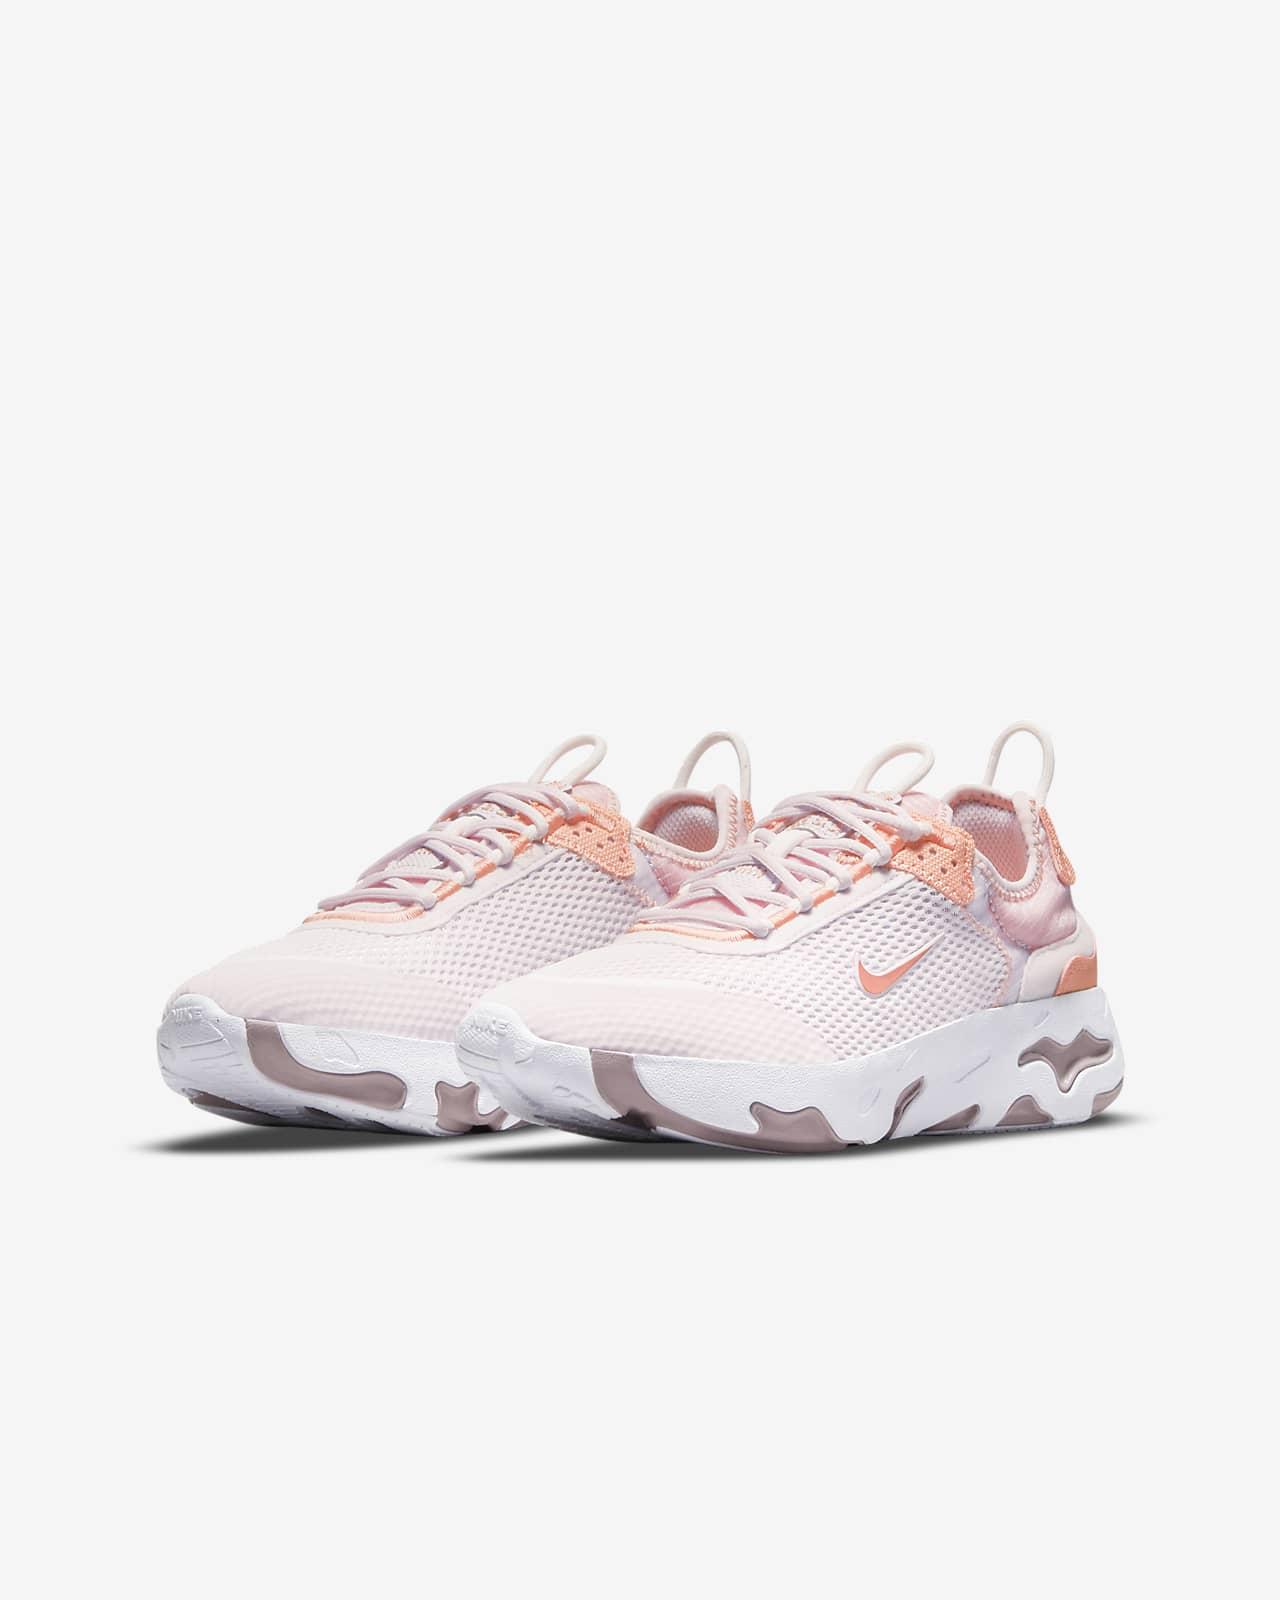 Nike React Live Big Kids' Shoe